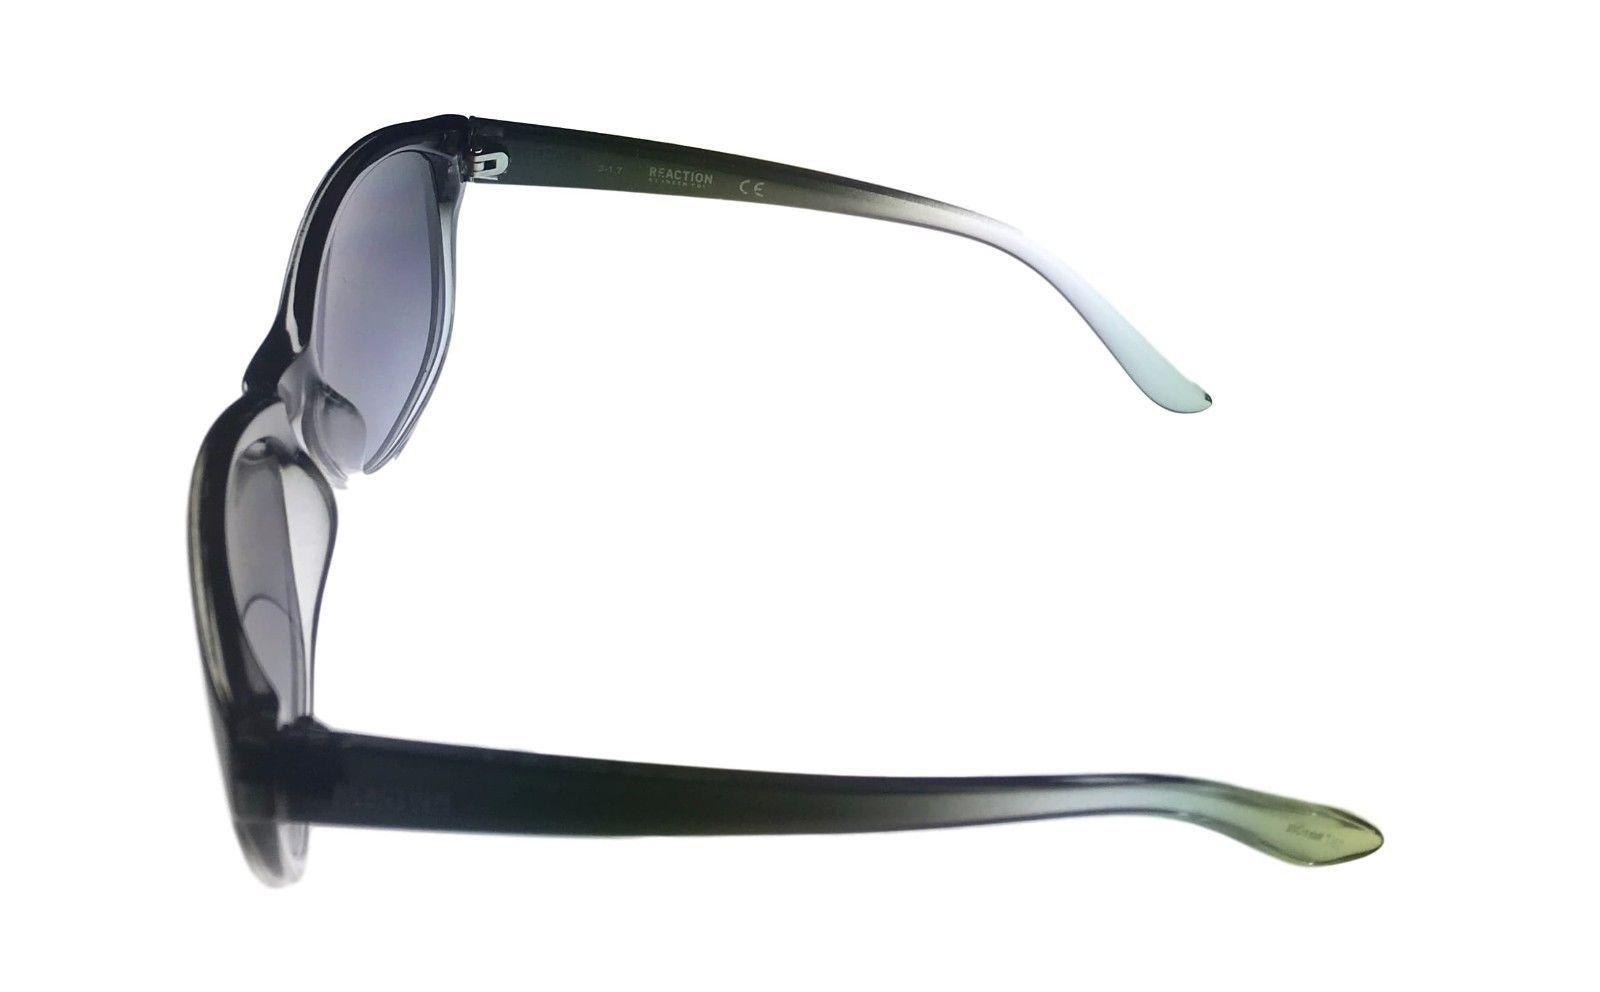 Kenneth Cole Reaction Mens Plastic Sunglass Black Fade, Gradient KC1290 5B image 3